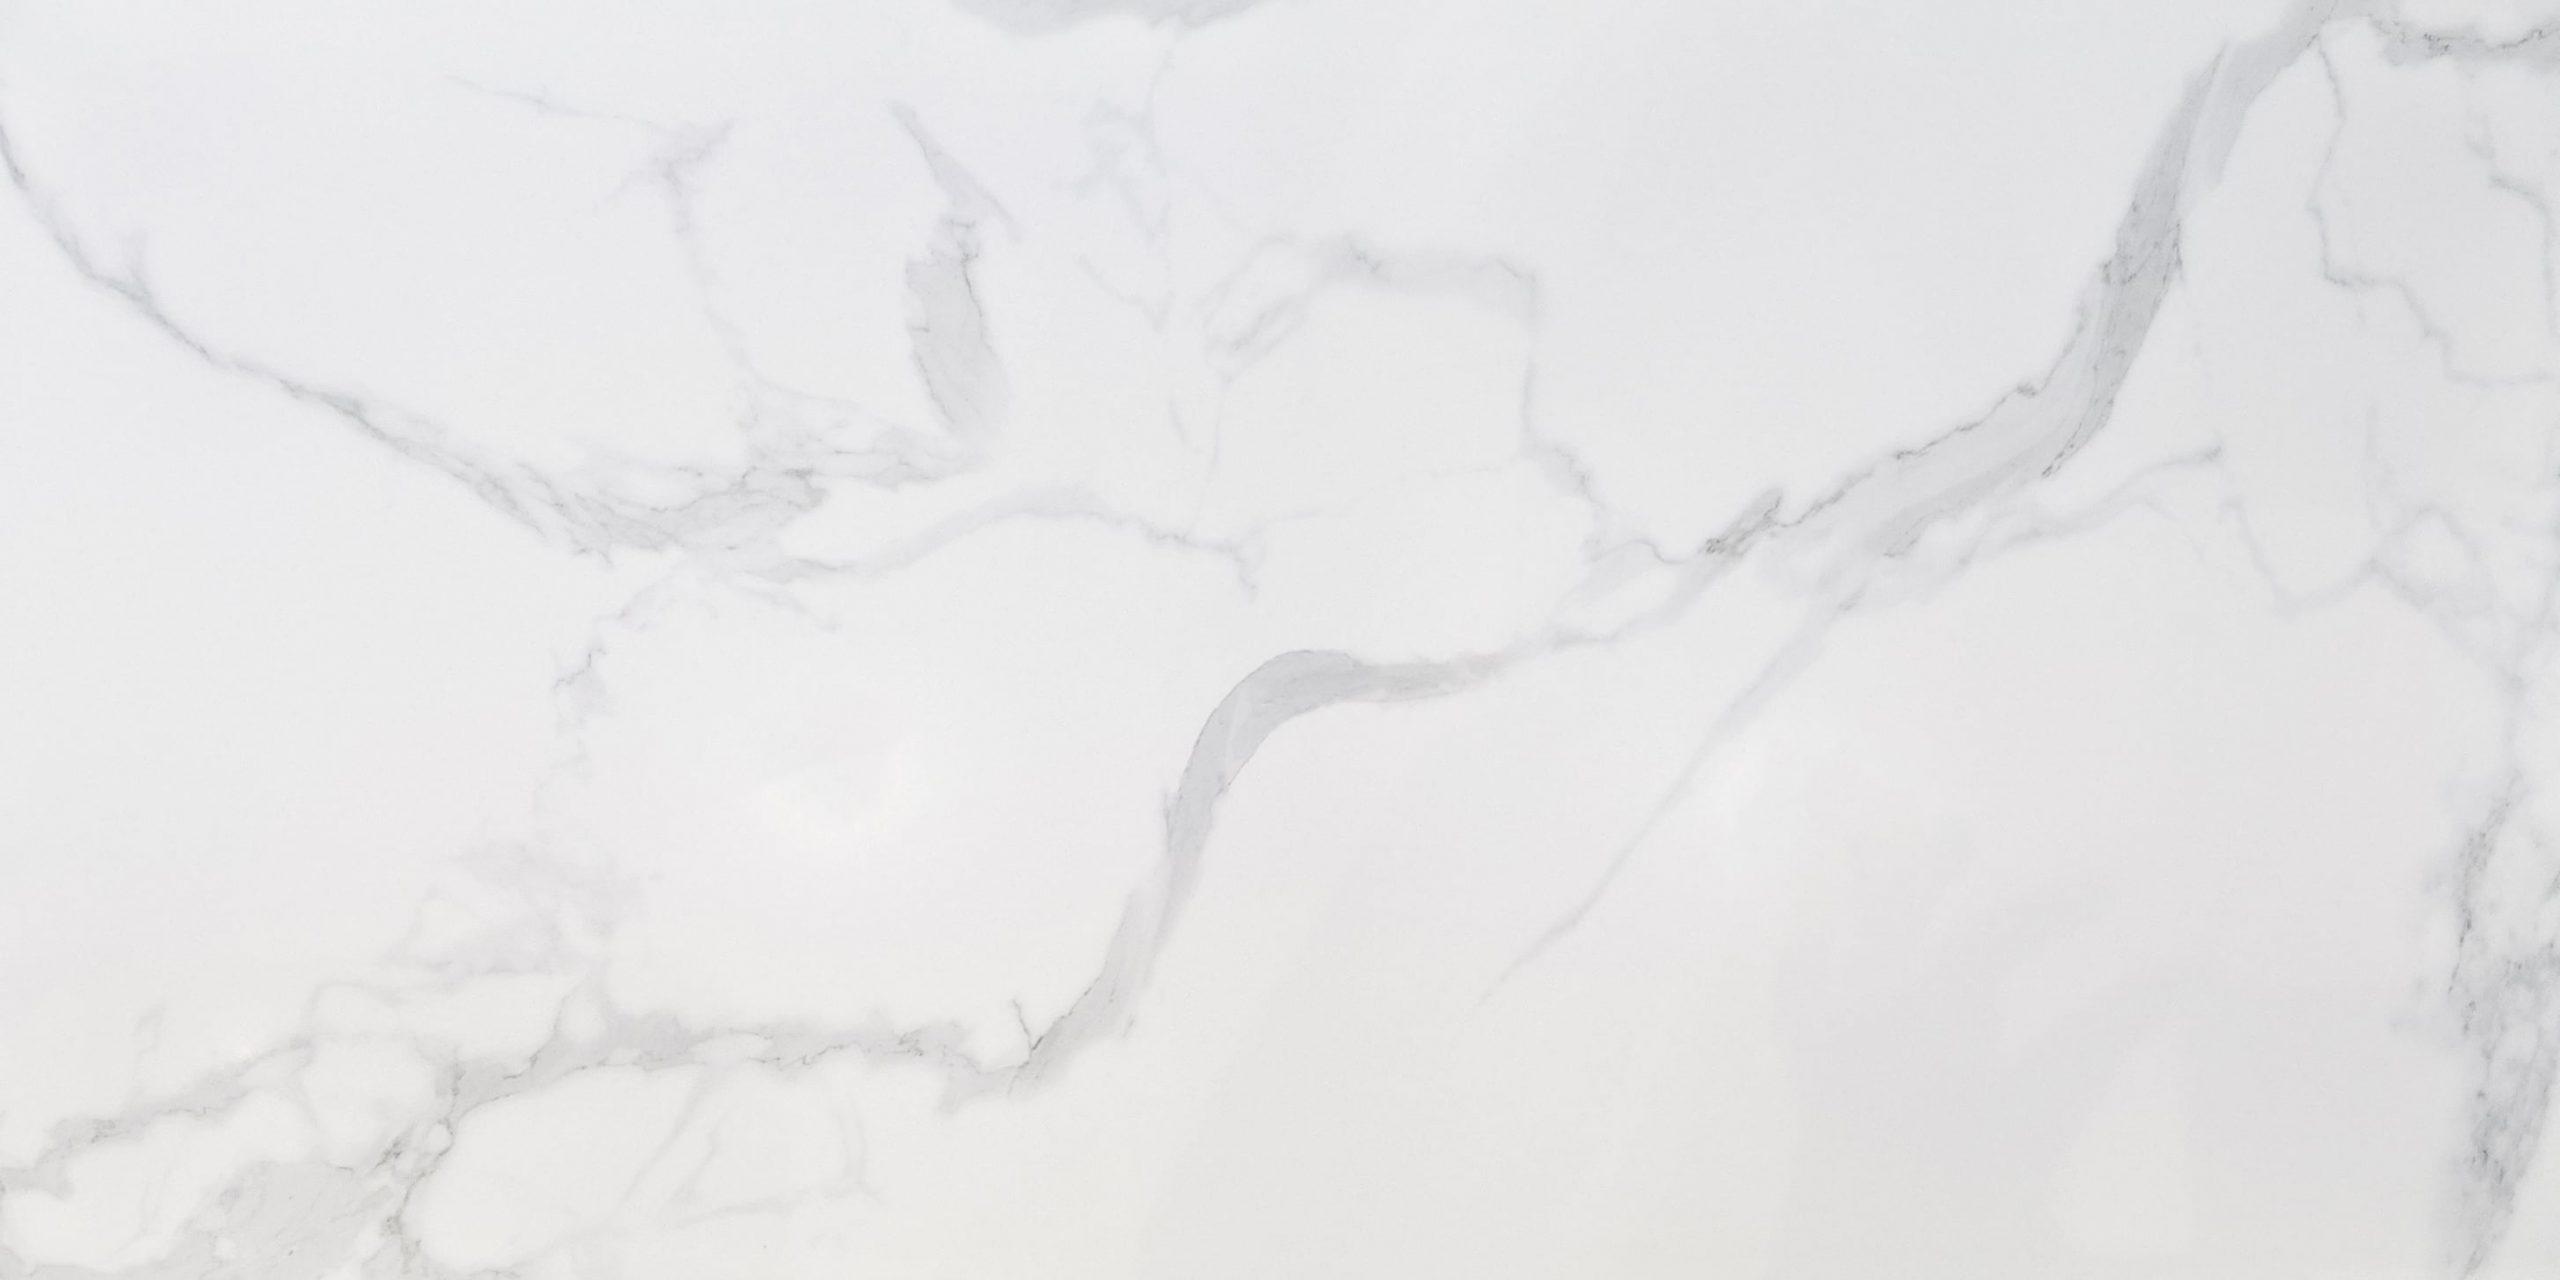 Map gạch 600x1200 BJY126R002